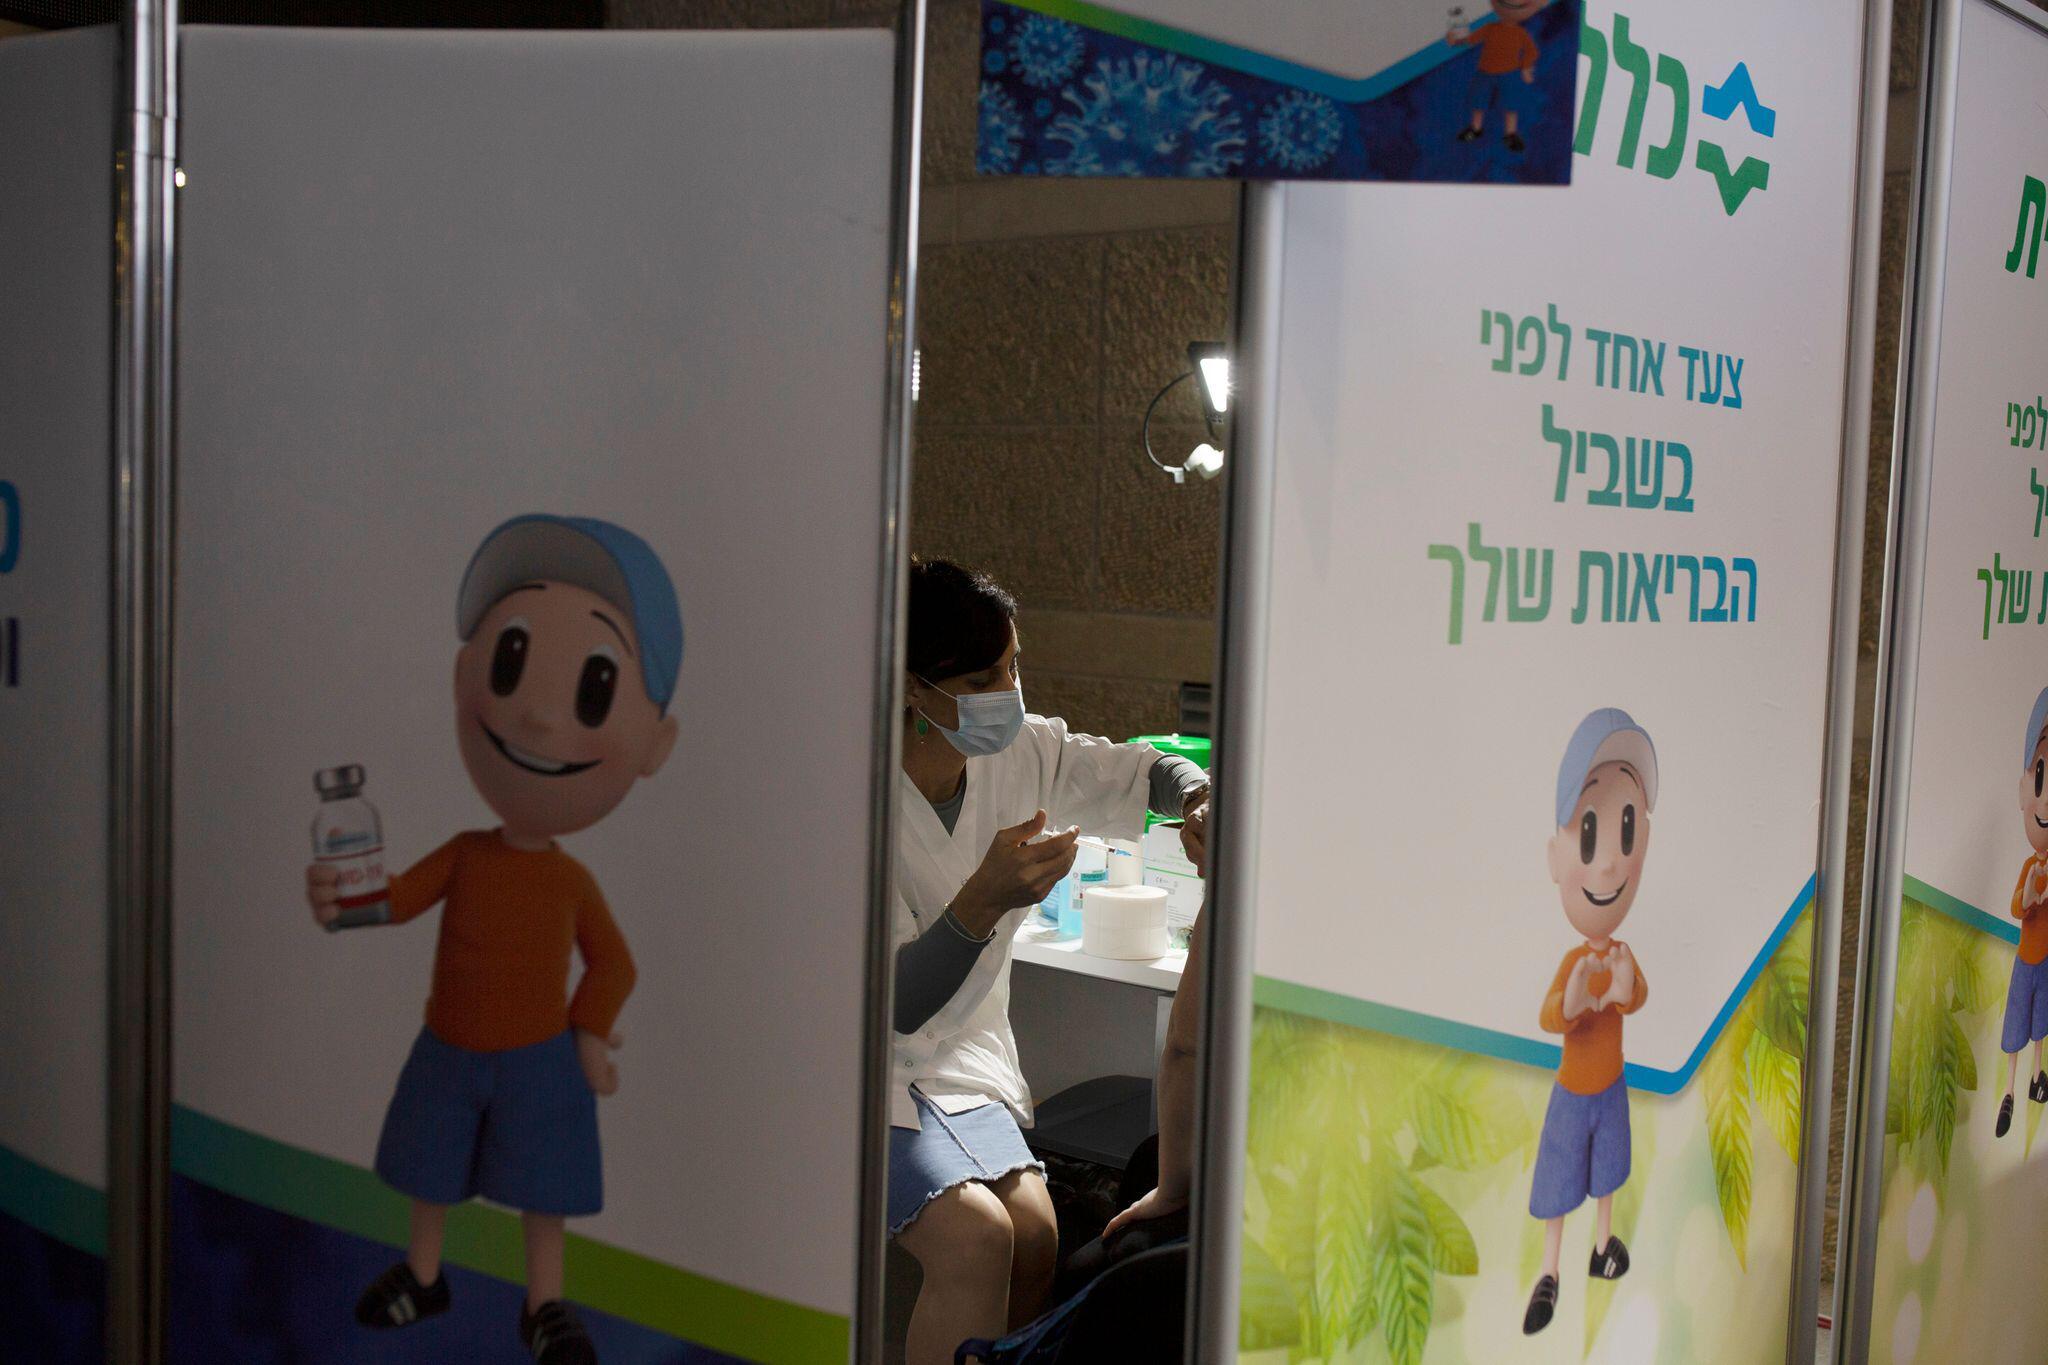 Bild zu Coronavirus - Impfbeginn in Israel